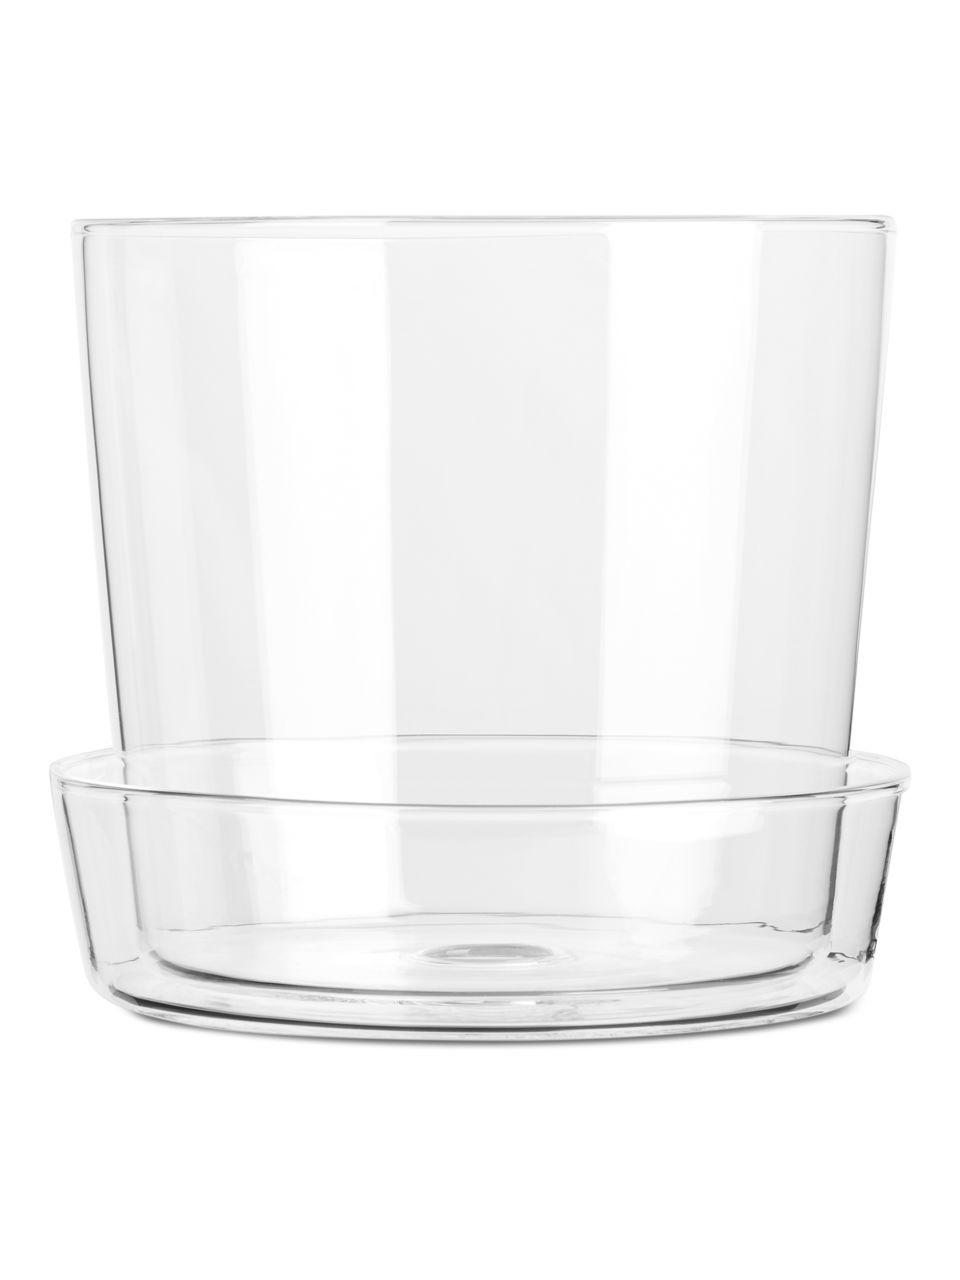 Glass Flower Pot 13 Cm Clear Home Arket In 2020 Flower Pots Terracotta Flower Pots Glass Planter